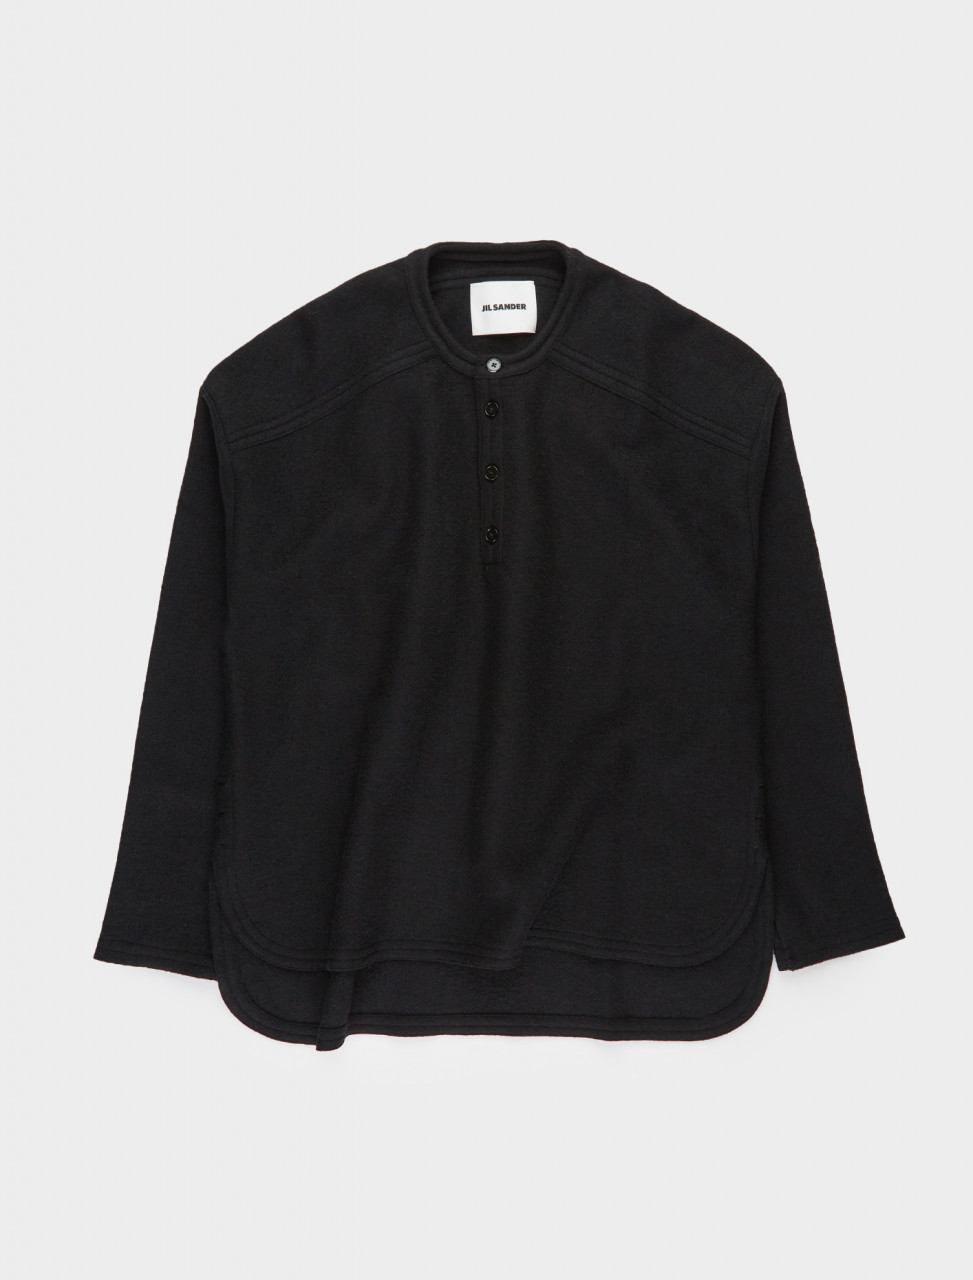 130-JSMR707004-MR217808-001 JIL SANDER Half-Button Long Sleeve Polo in Black